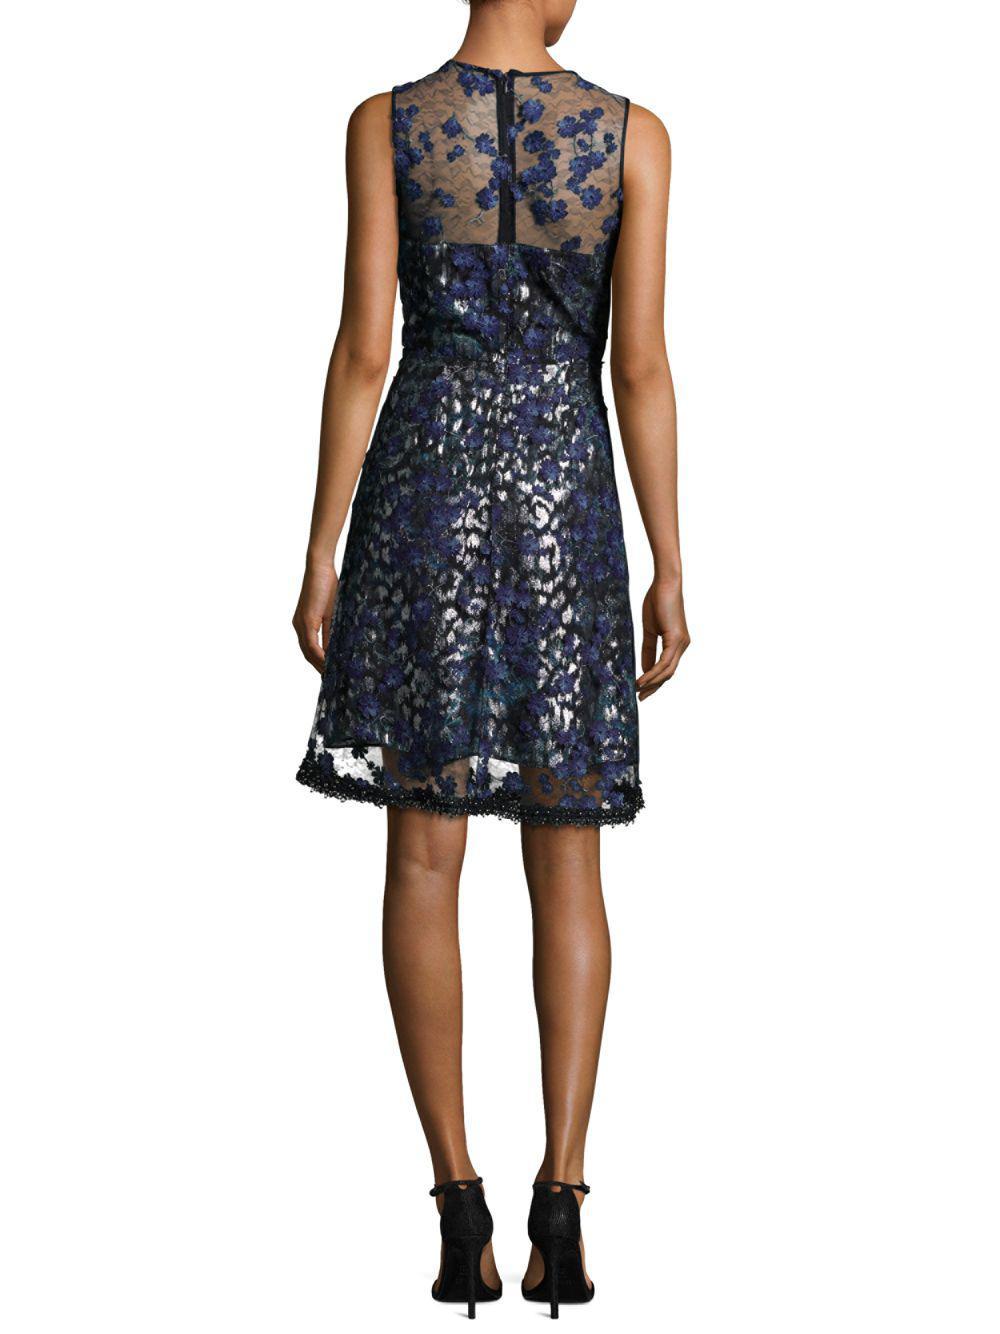 93af3a1f708d Elie Tahari Olive Embroidered Illusion Dress in Blue - Lyst